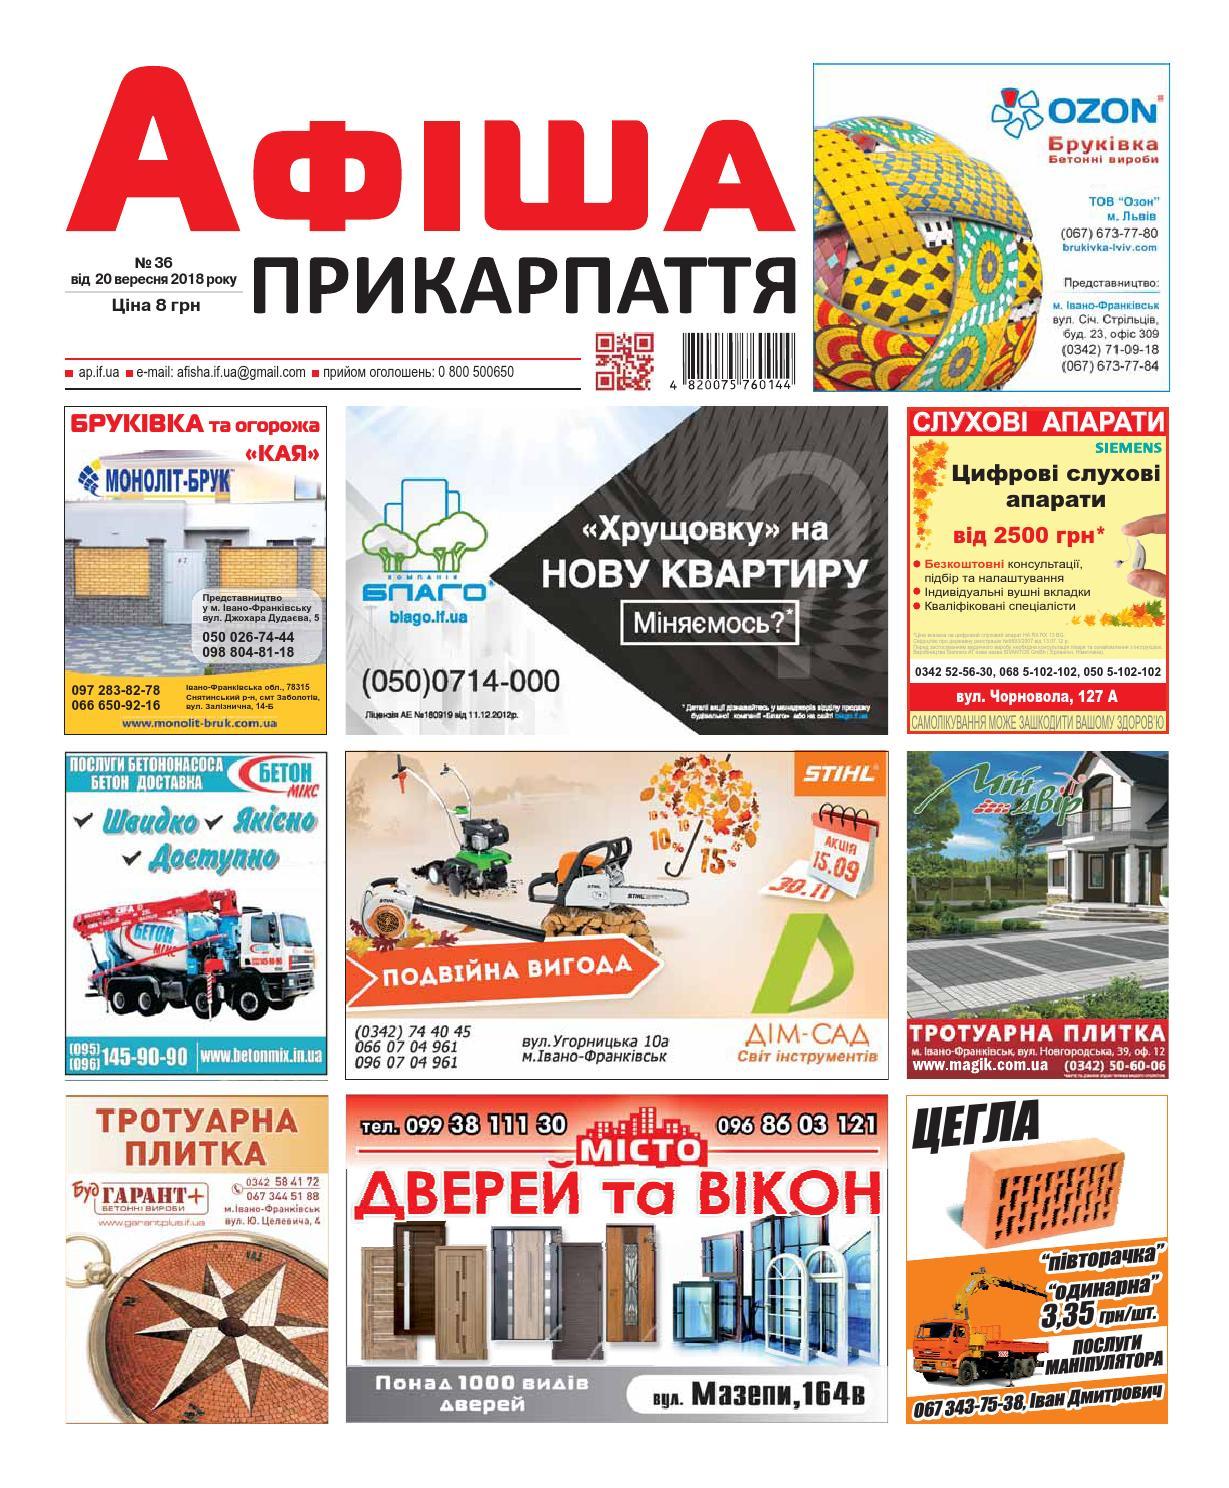 Афіша Прикарпаття №36 by Olya Olya - issuu 70b416cf4fe6d